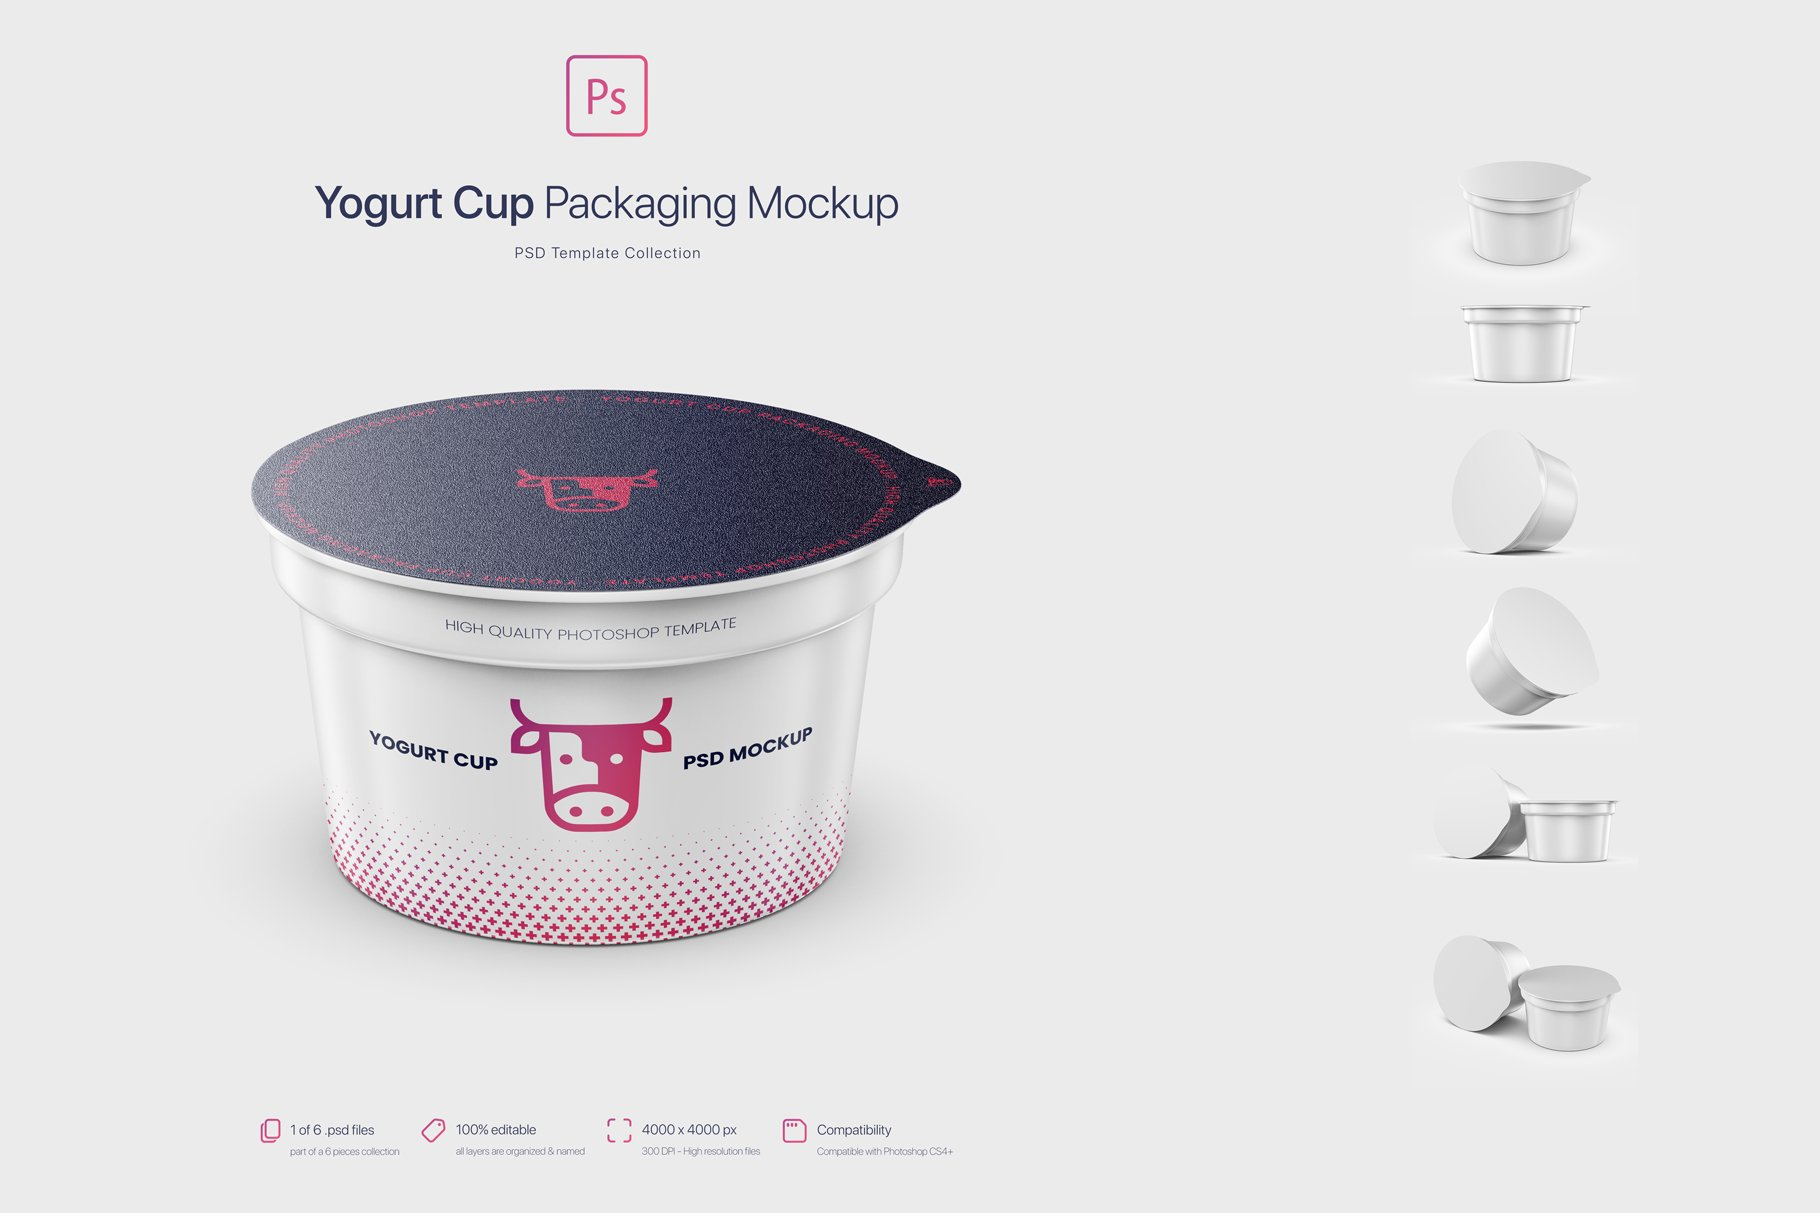 6款逼真高质量酸奶杯设计展示样机 Yogurt Cup Packaging Mockup插图